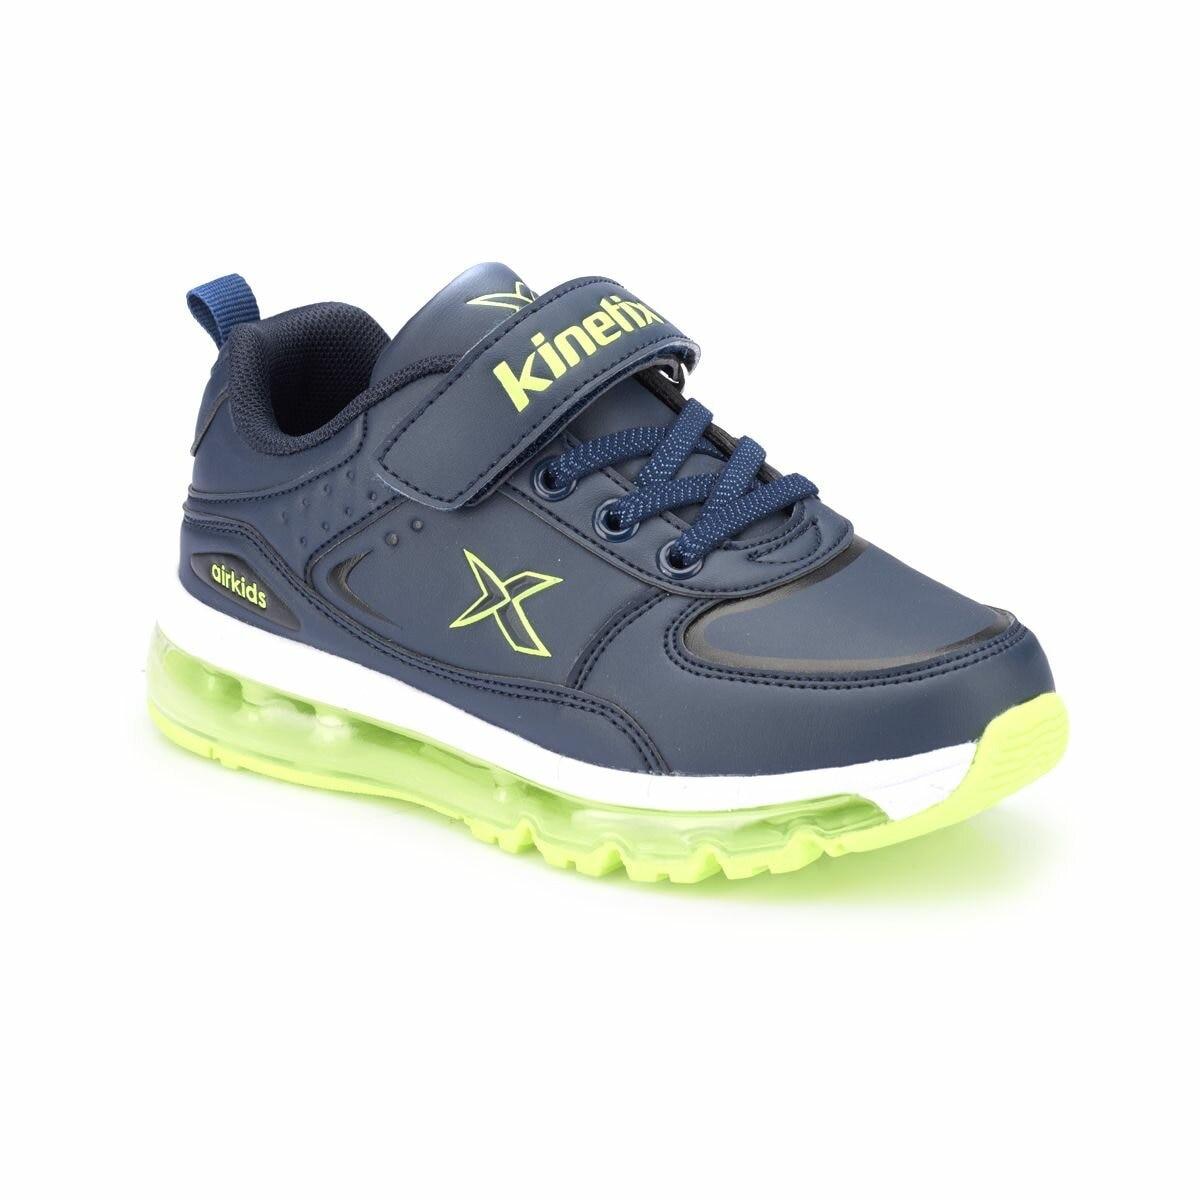 FLO LONAIR Navy Blue Male Child Running Shoes KINETIX